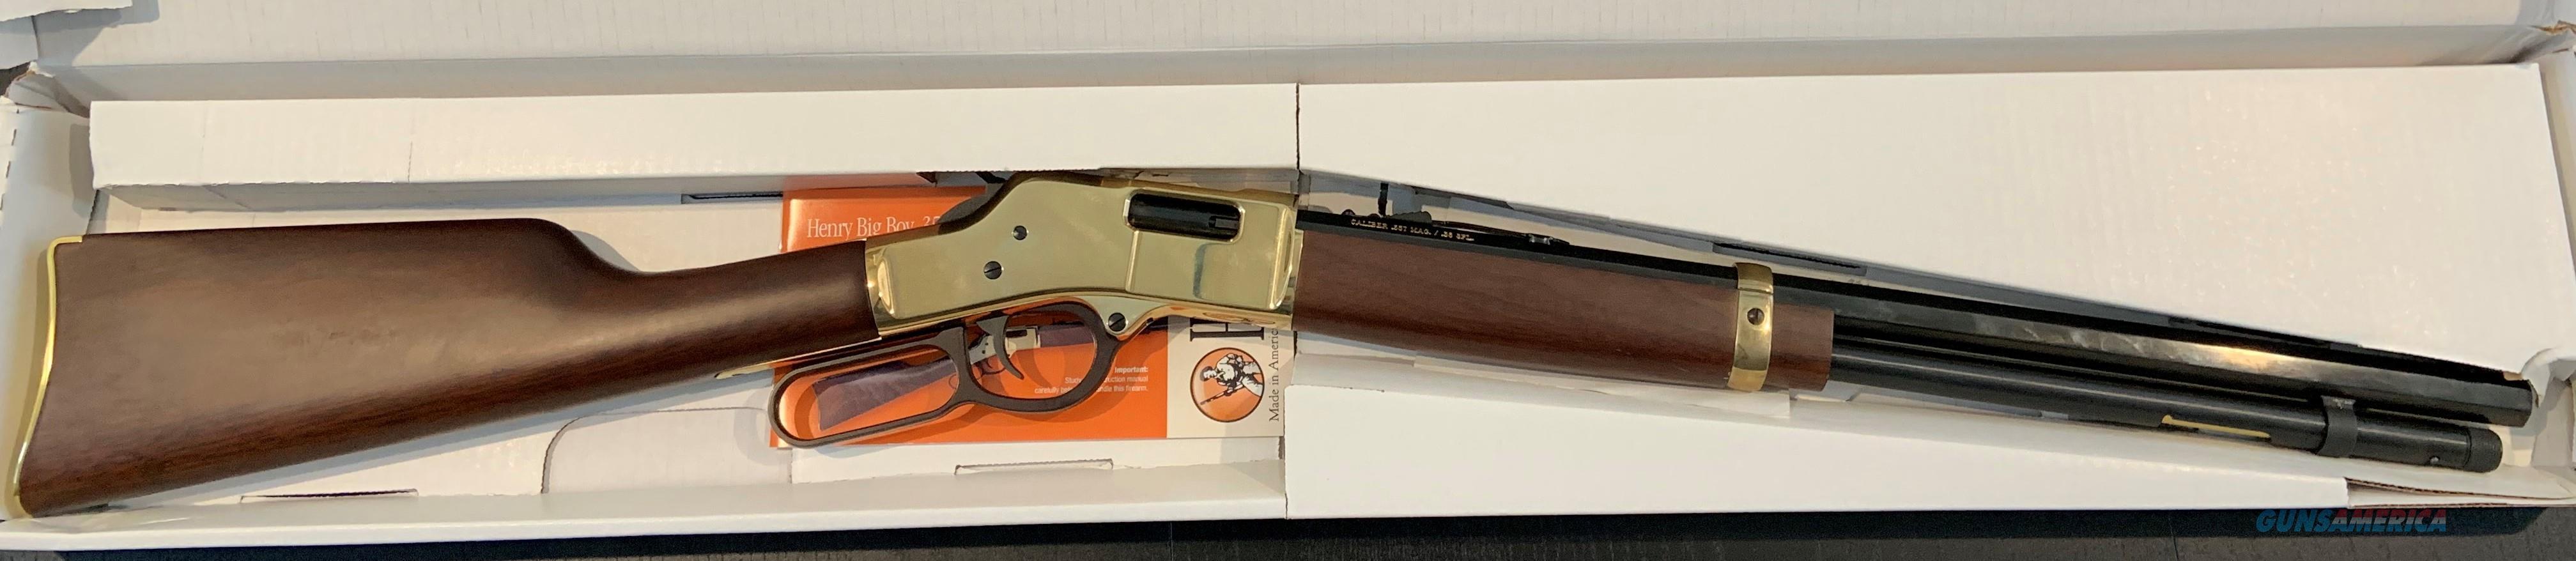 Henry Big Boy Brass 357 Mag 20In Octagon  Guns > Rifles > Henry Rifle Company